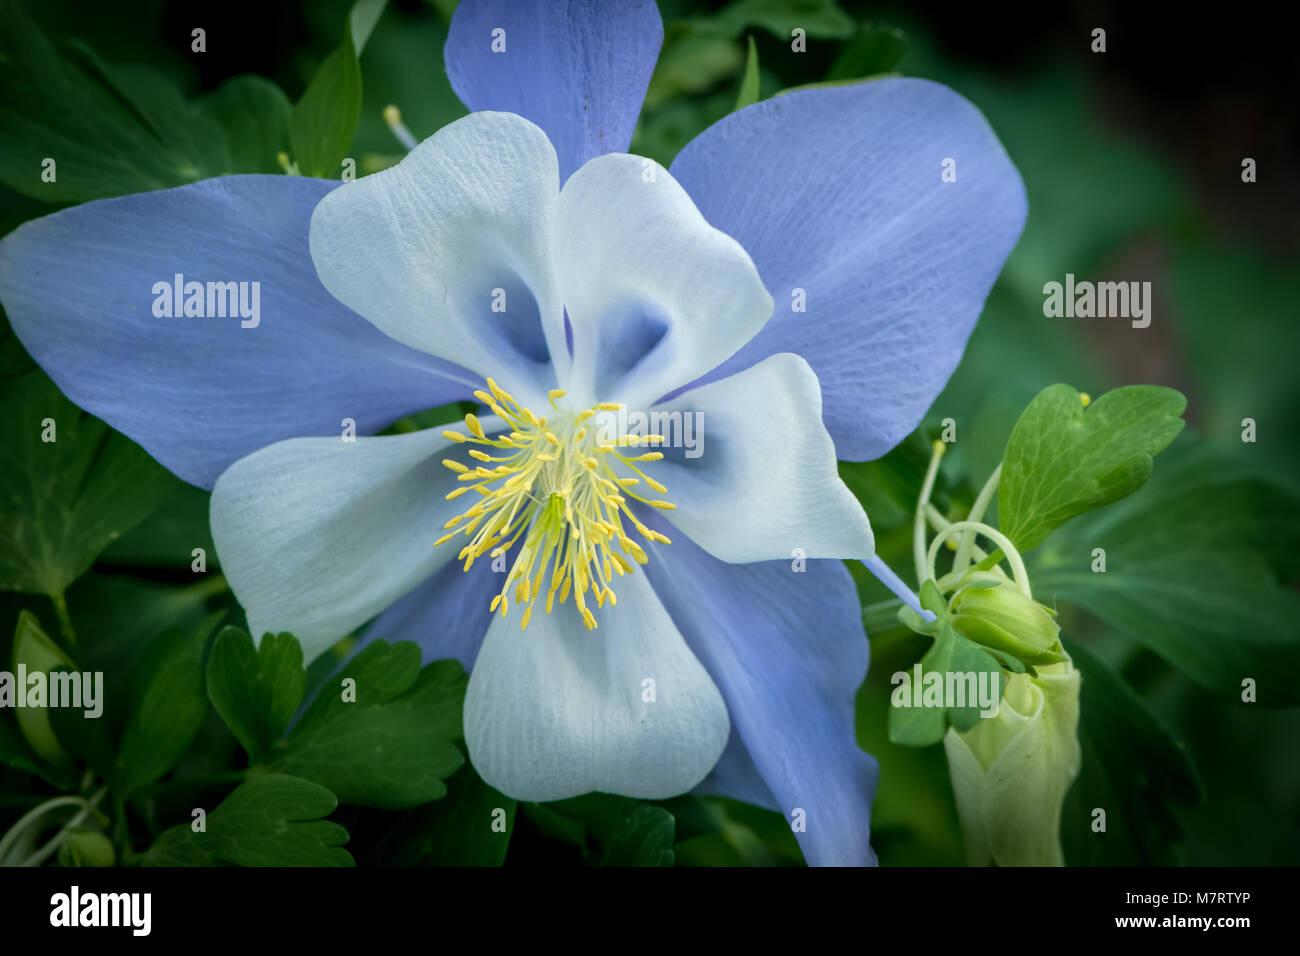 Colorado blue columbine aquilegia coerulea stock photo 176930762 colorado blue columbine aquilegia coerulea izmirmasajfo Images